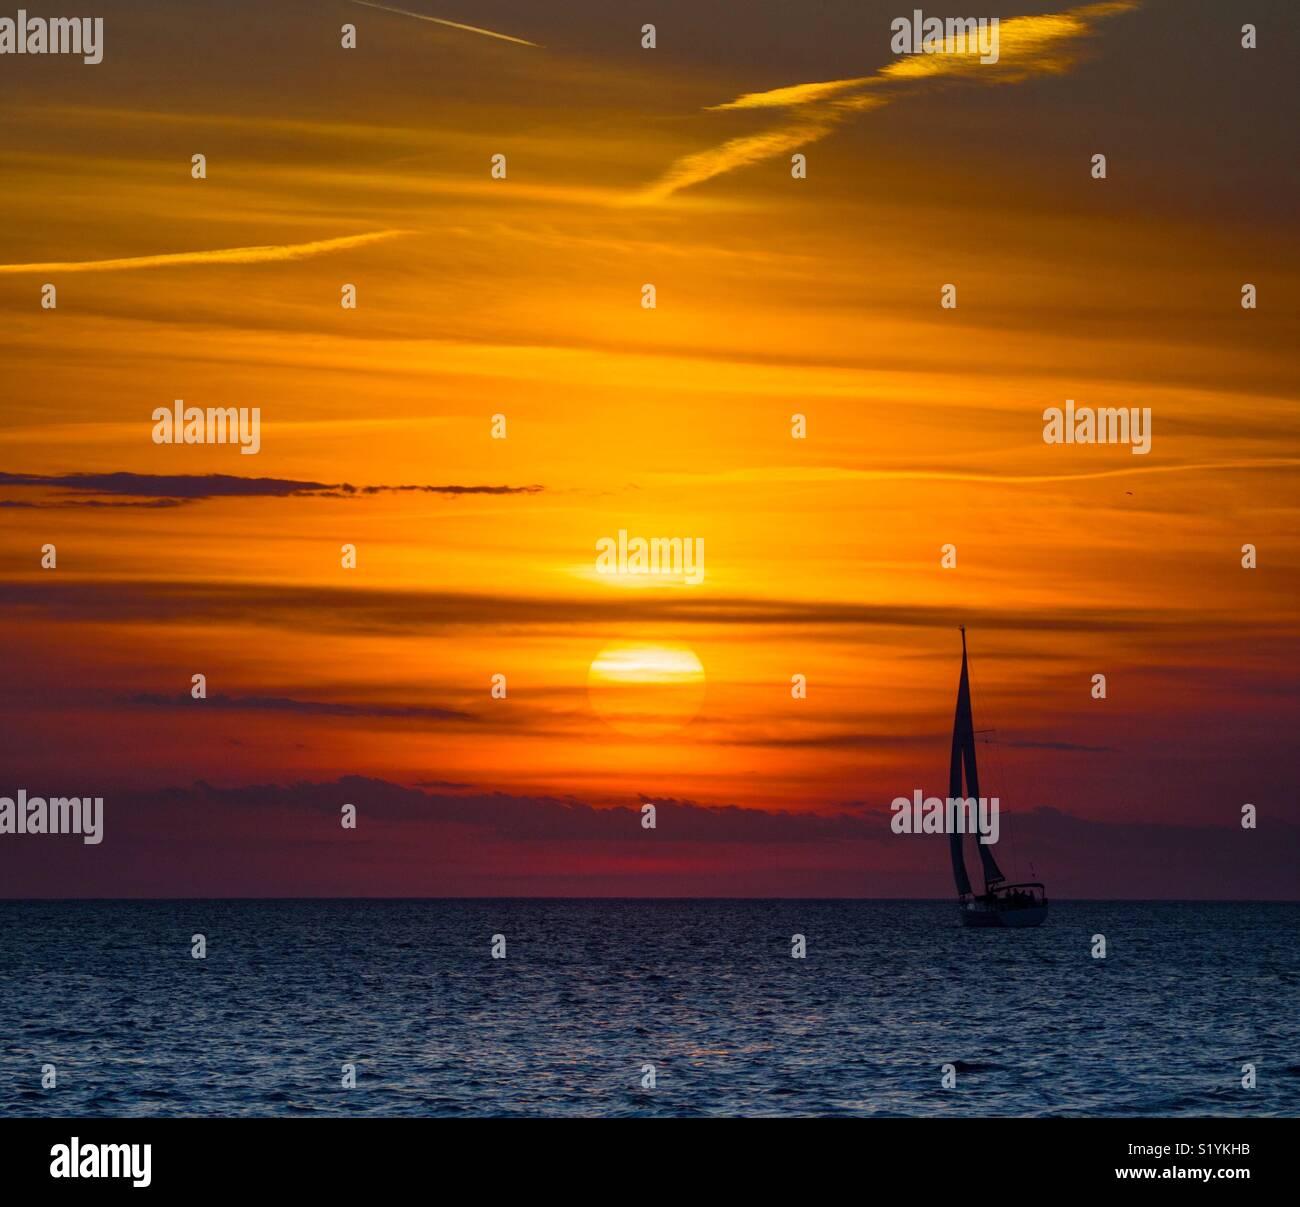 Atardecer en Zadar, Croacia Imagen De Stock